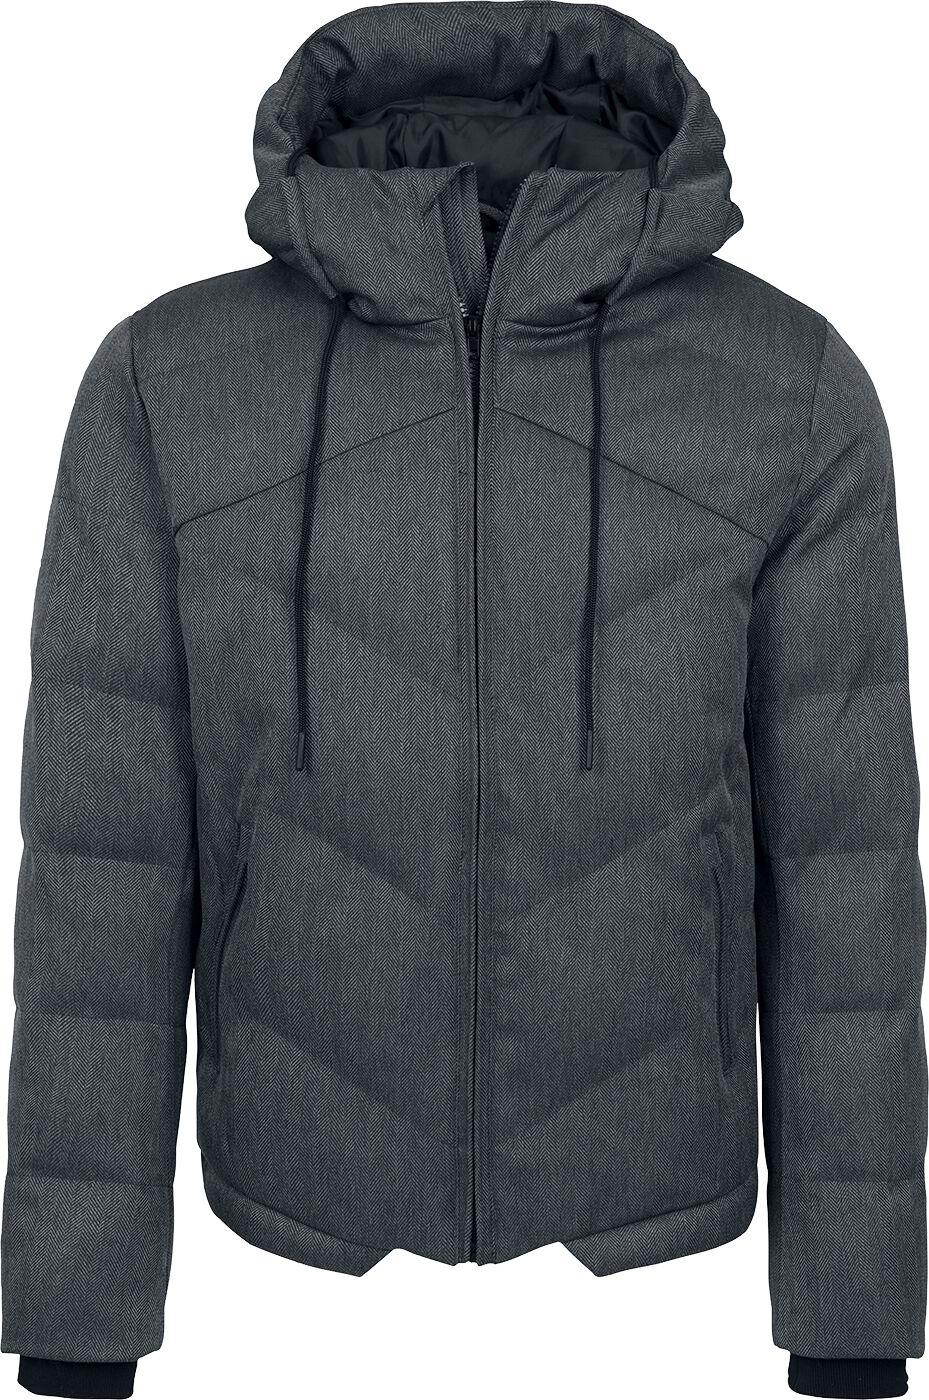 Image of   Urban Classics Heringbone Hooded Winter Jacket Vinterjakker mørk grå